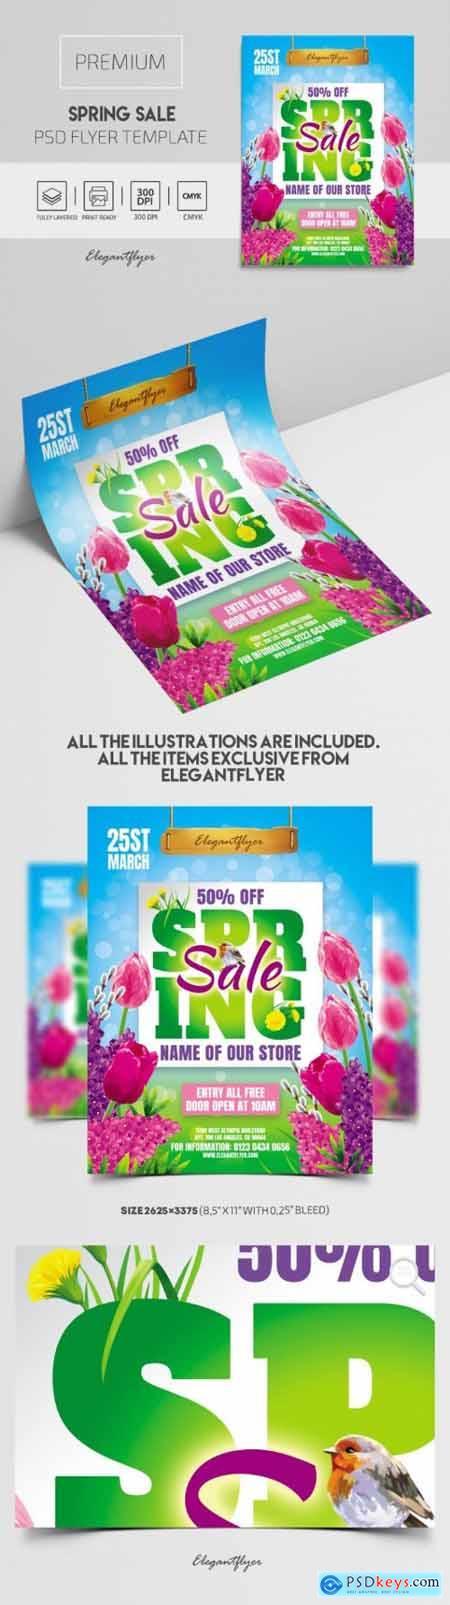 Spring Sale – Premium PSD Flyer Template